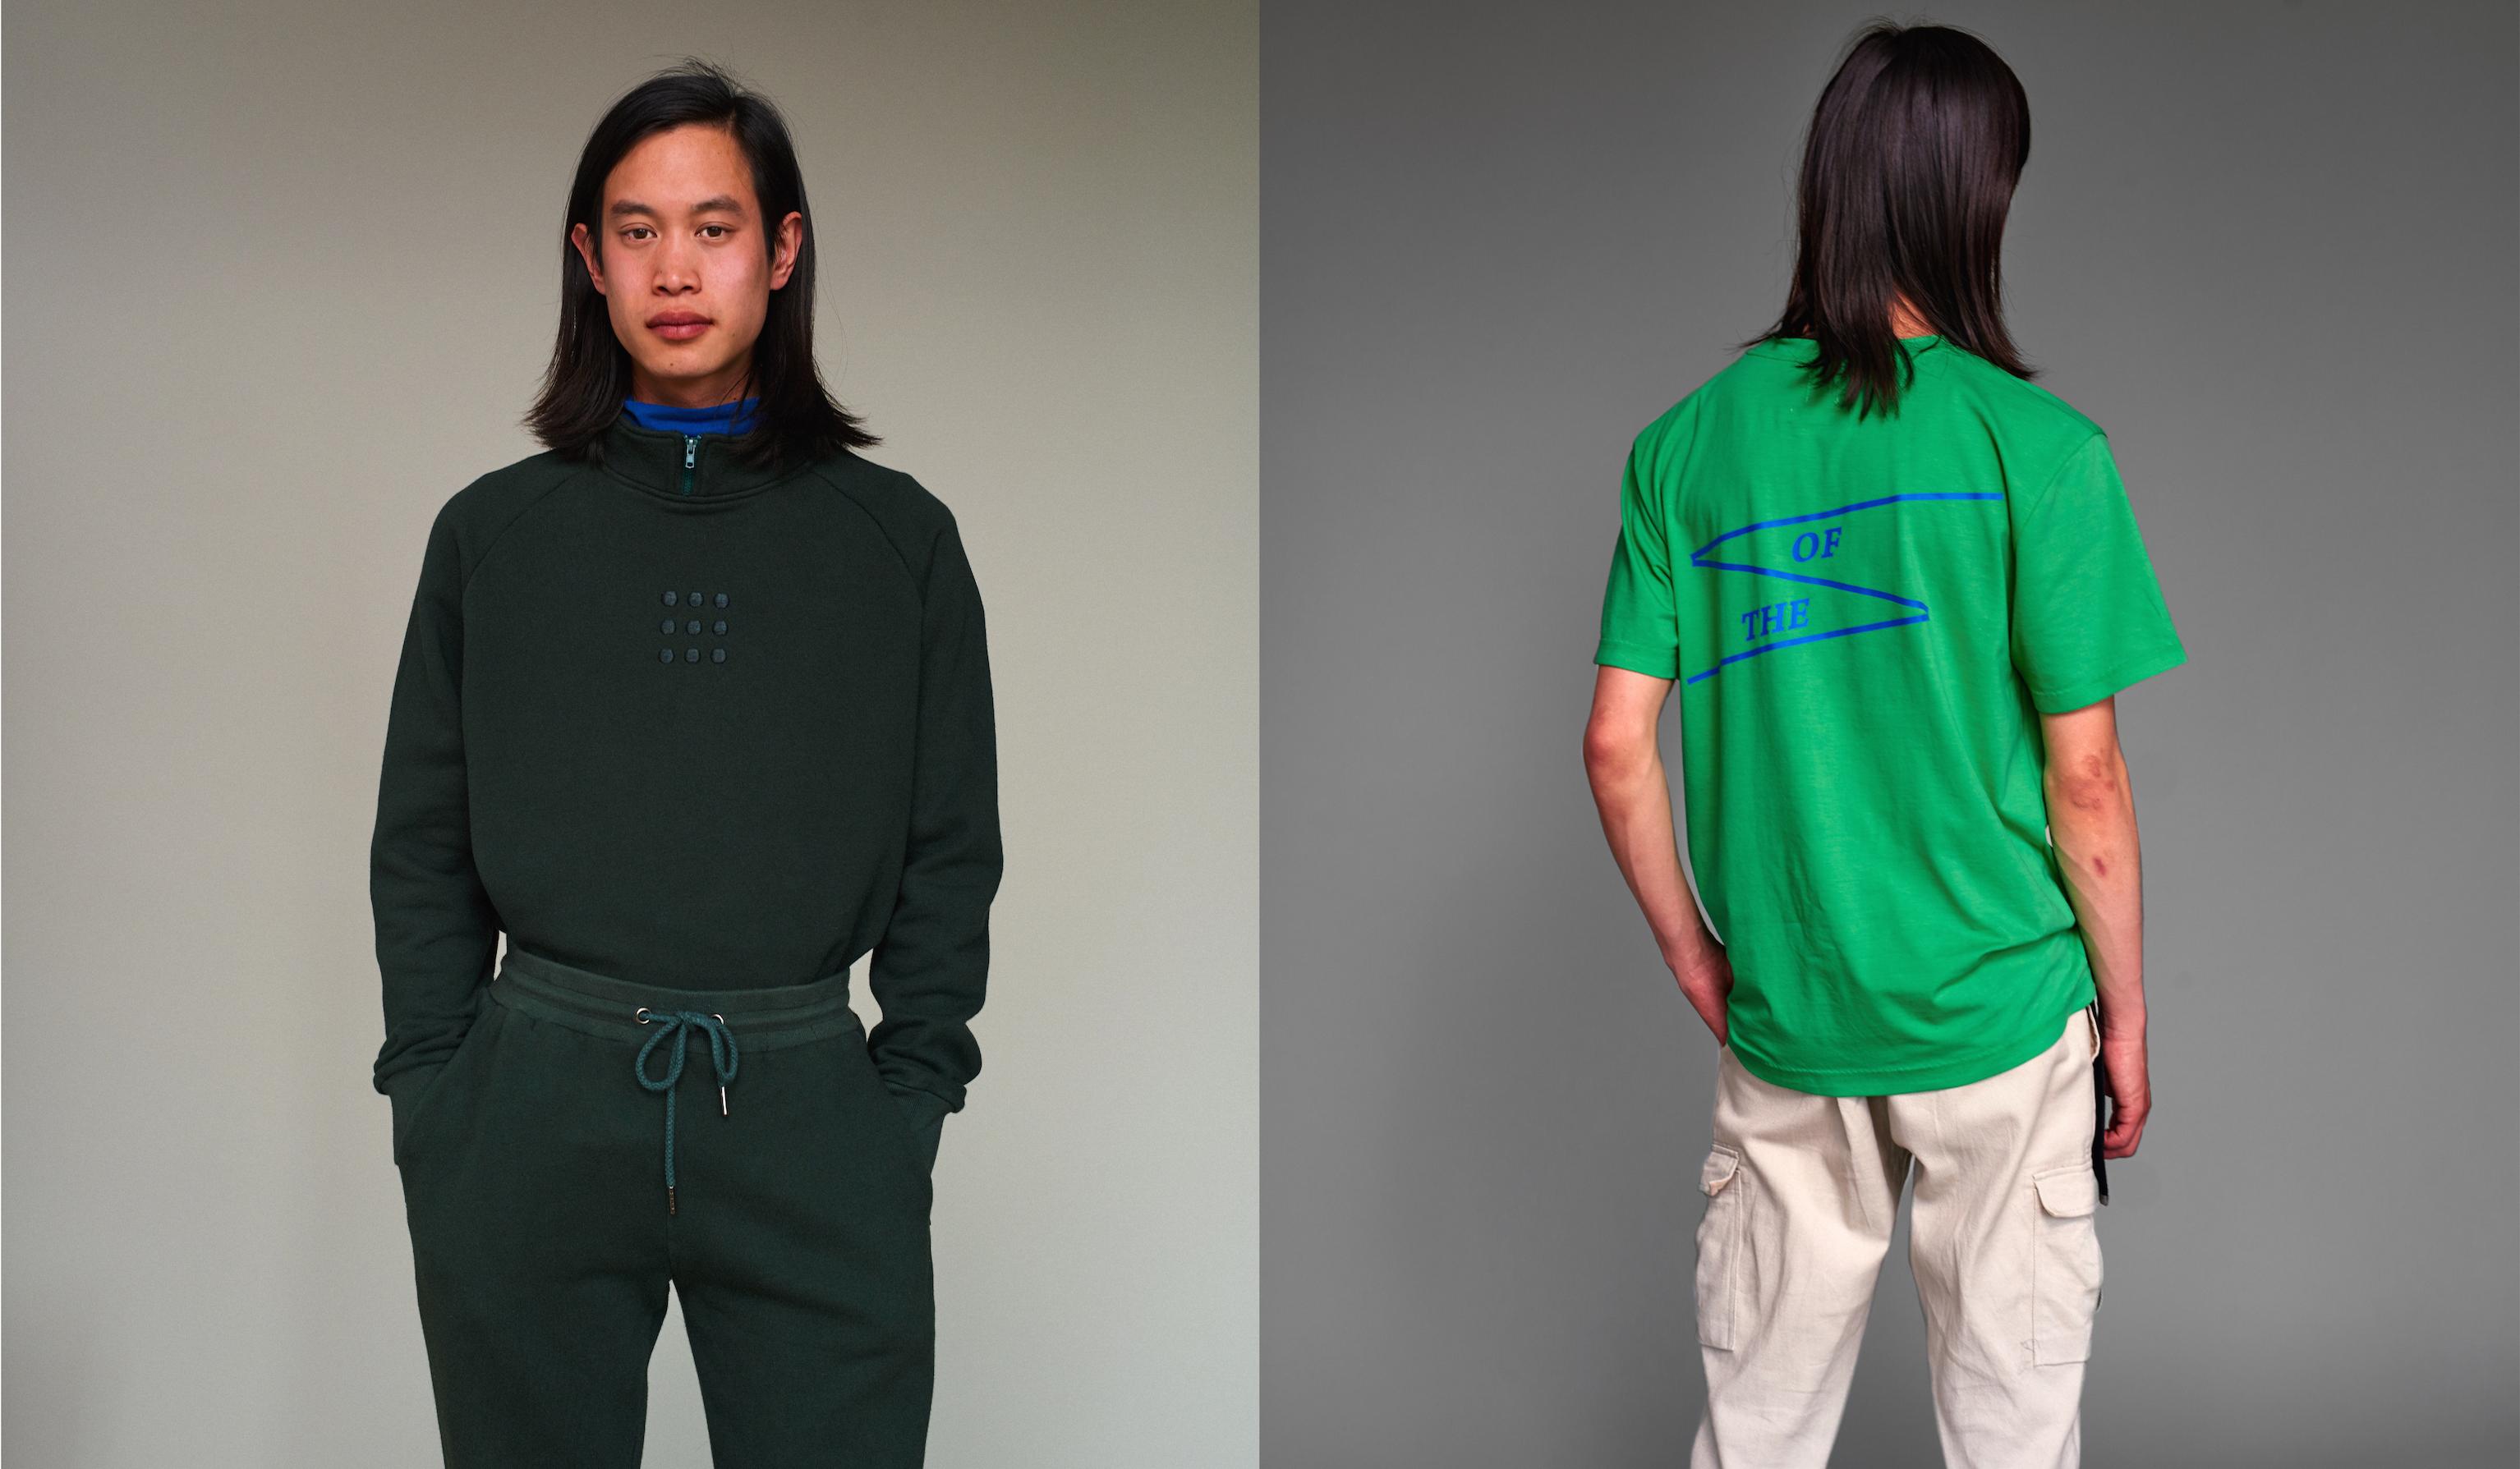 beste kledingmerken mannen